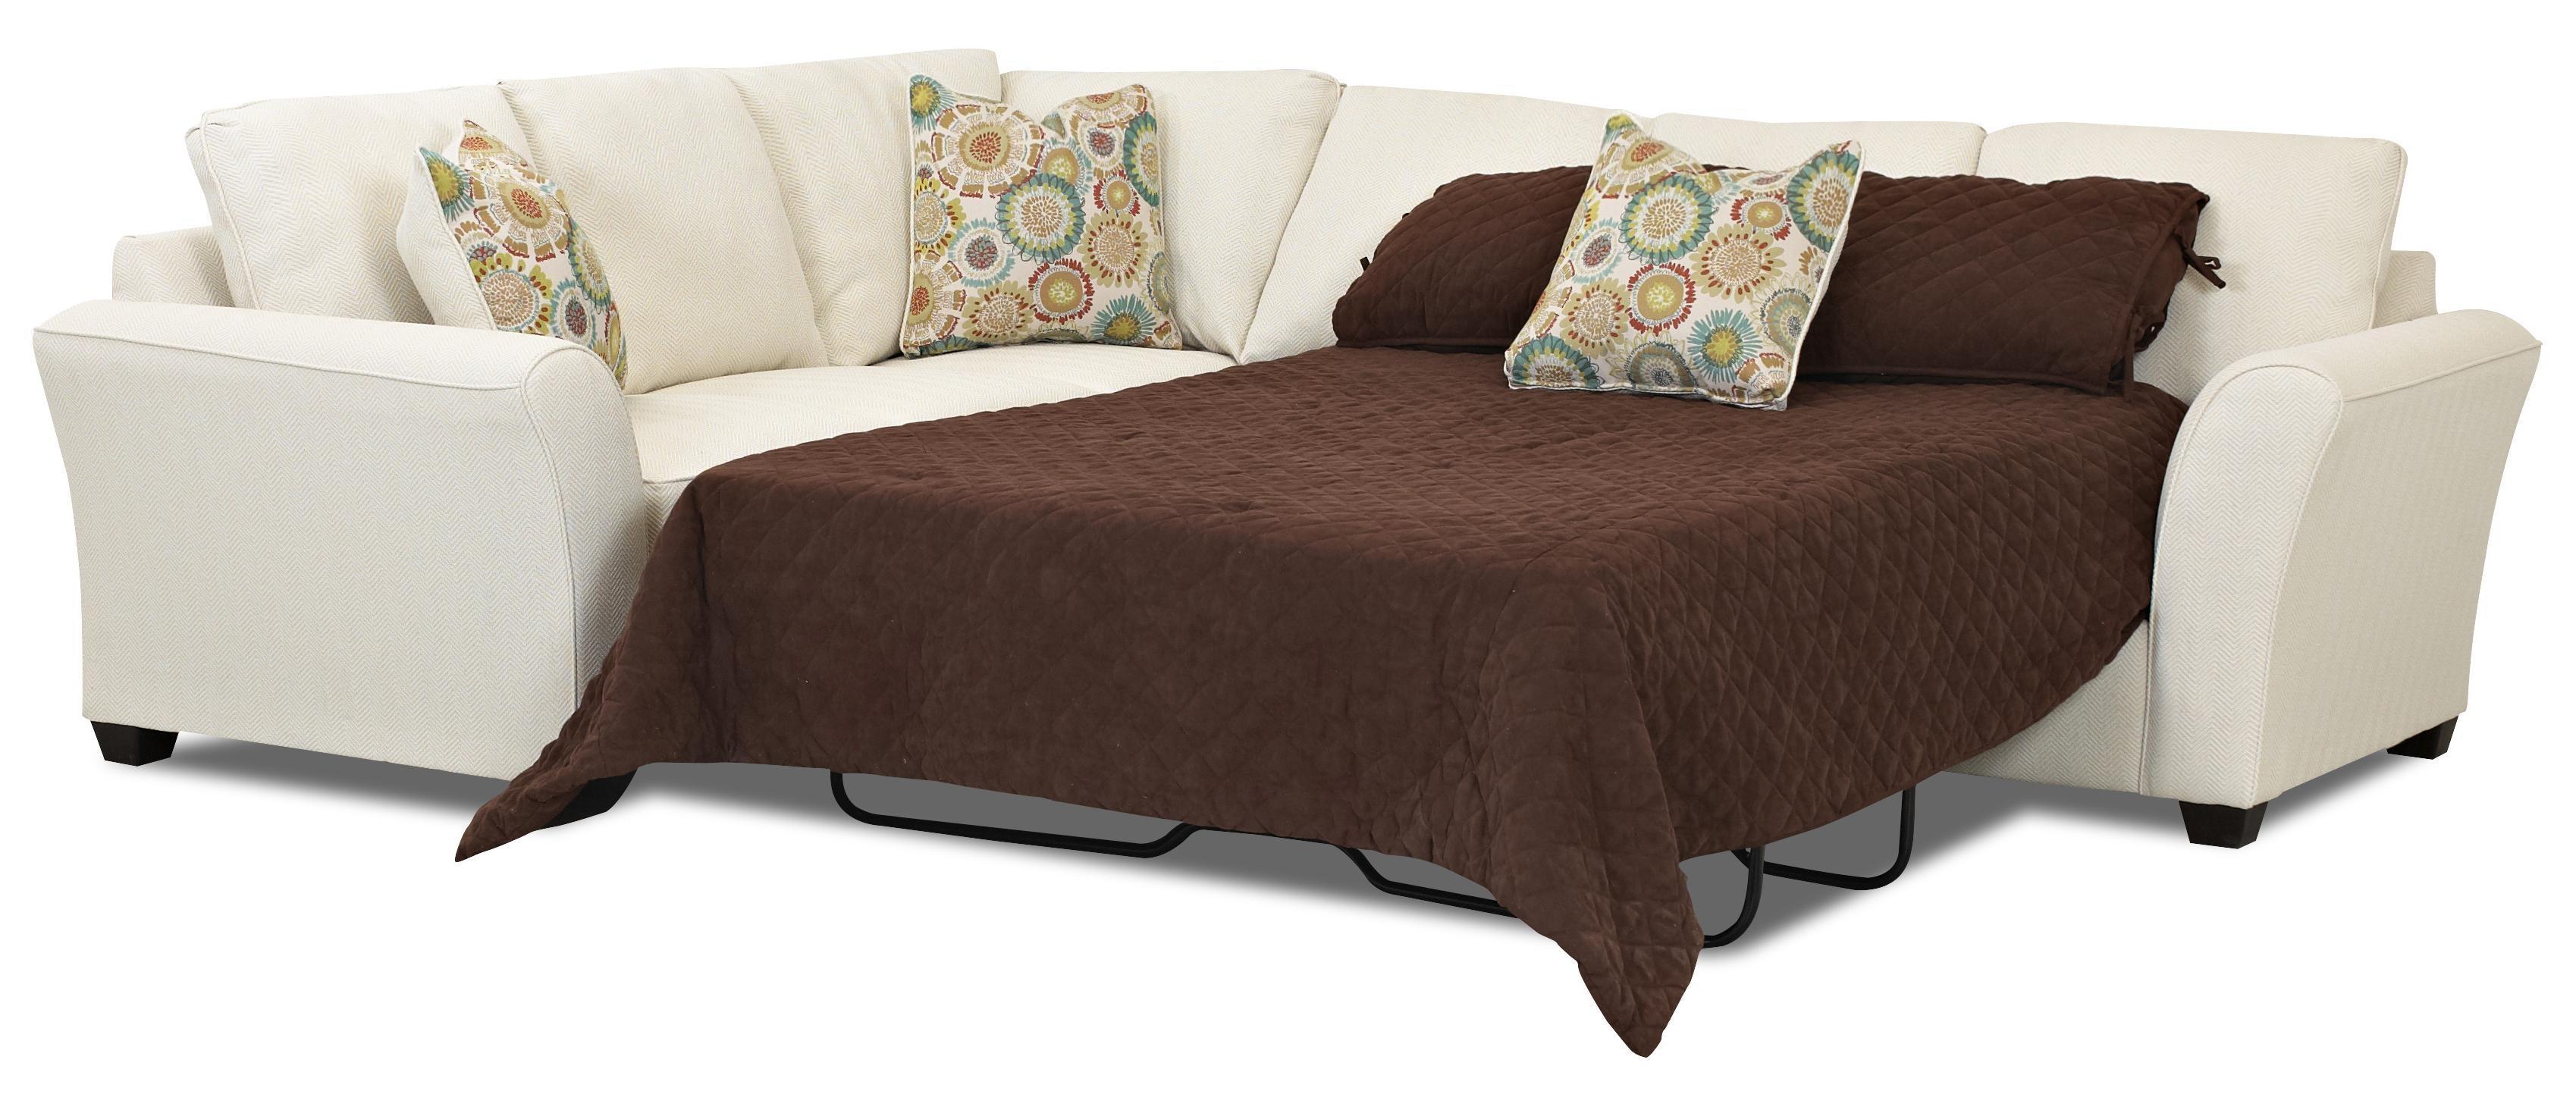 sofa sleeper cover cushion seat covers 20 43 choices of sofas mattress ideas